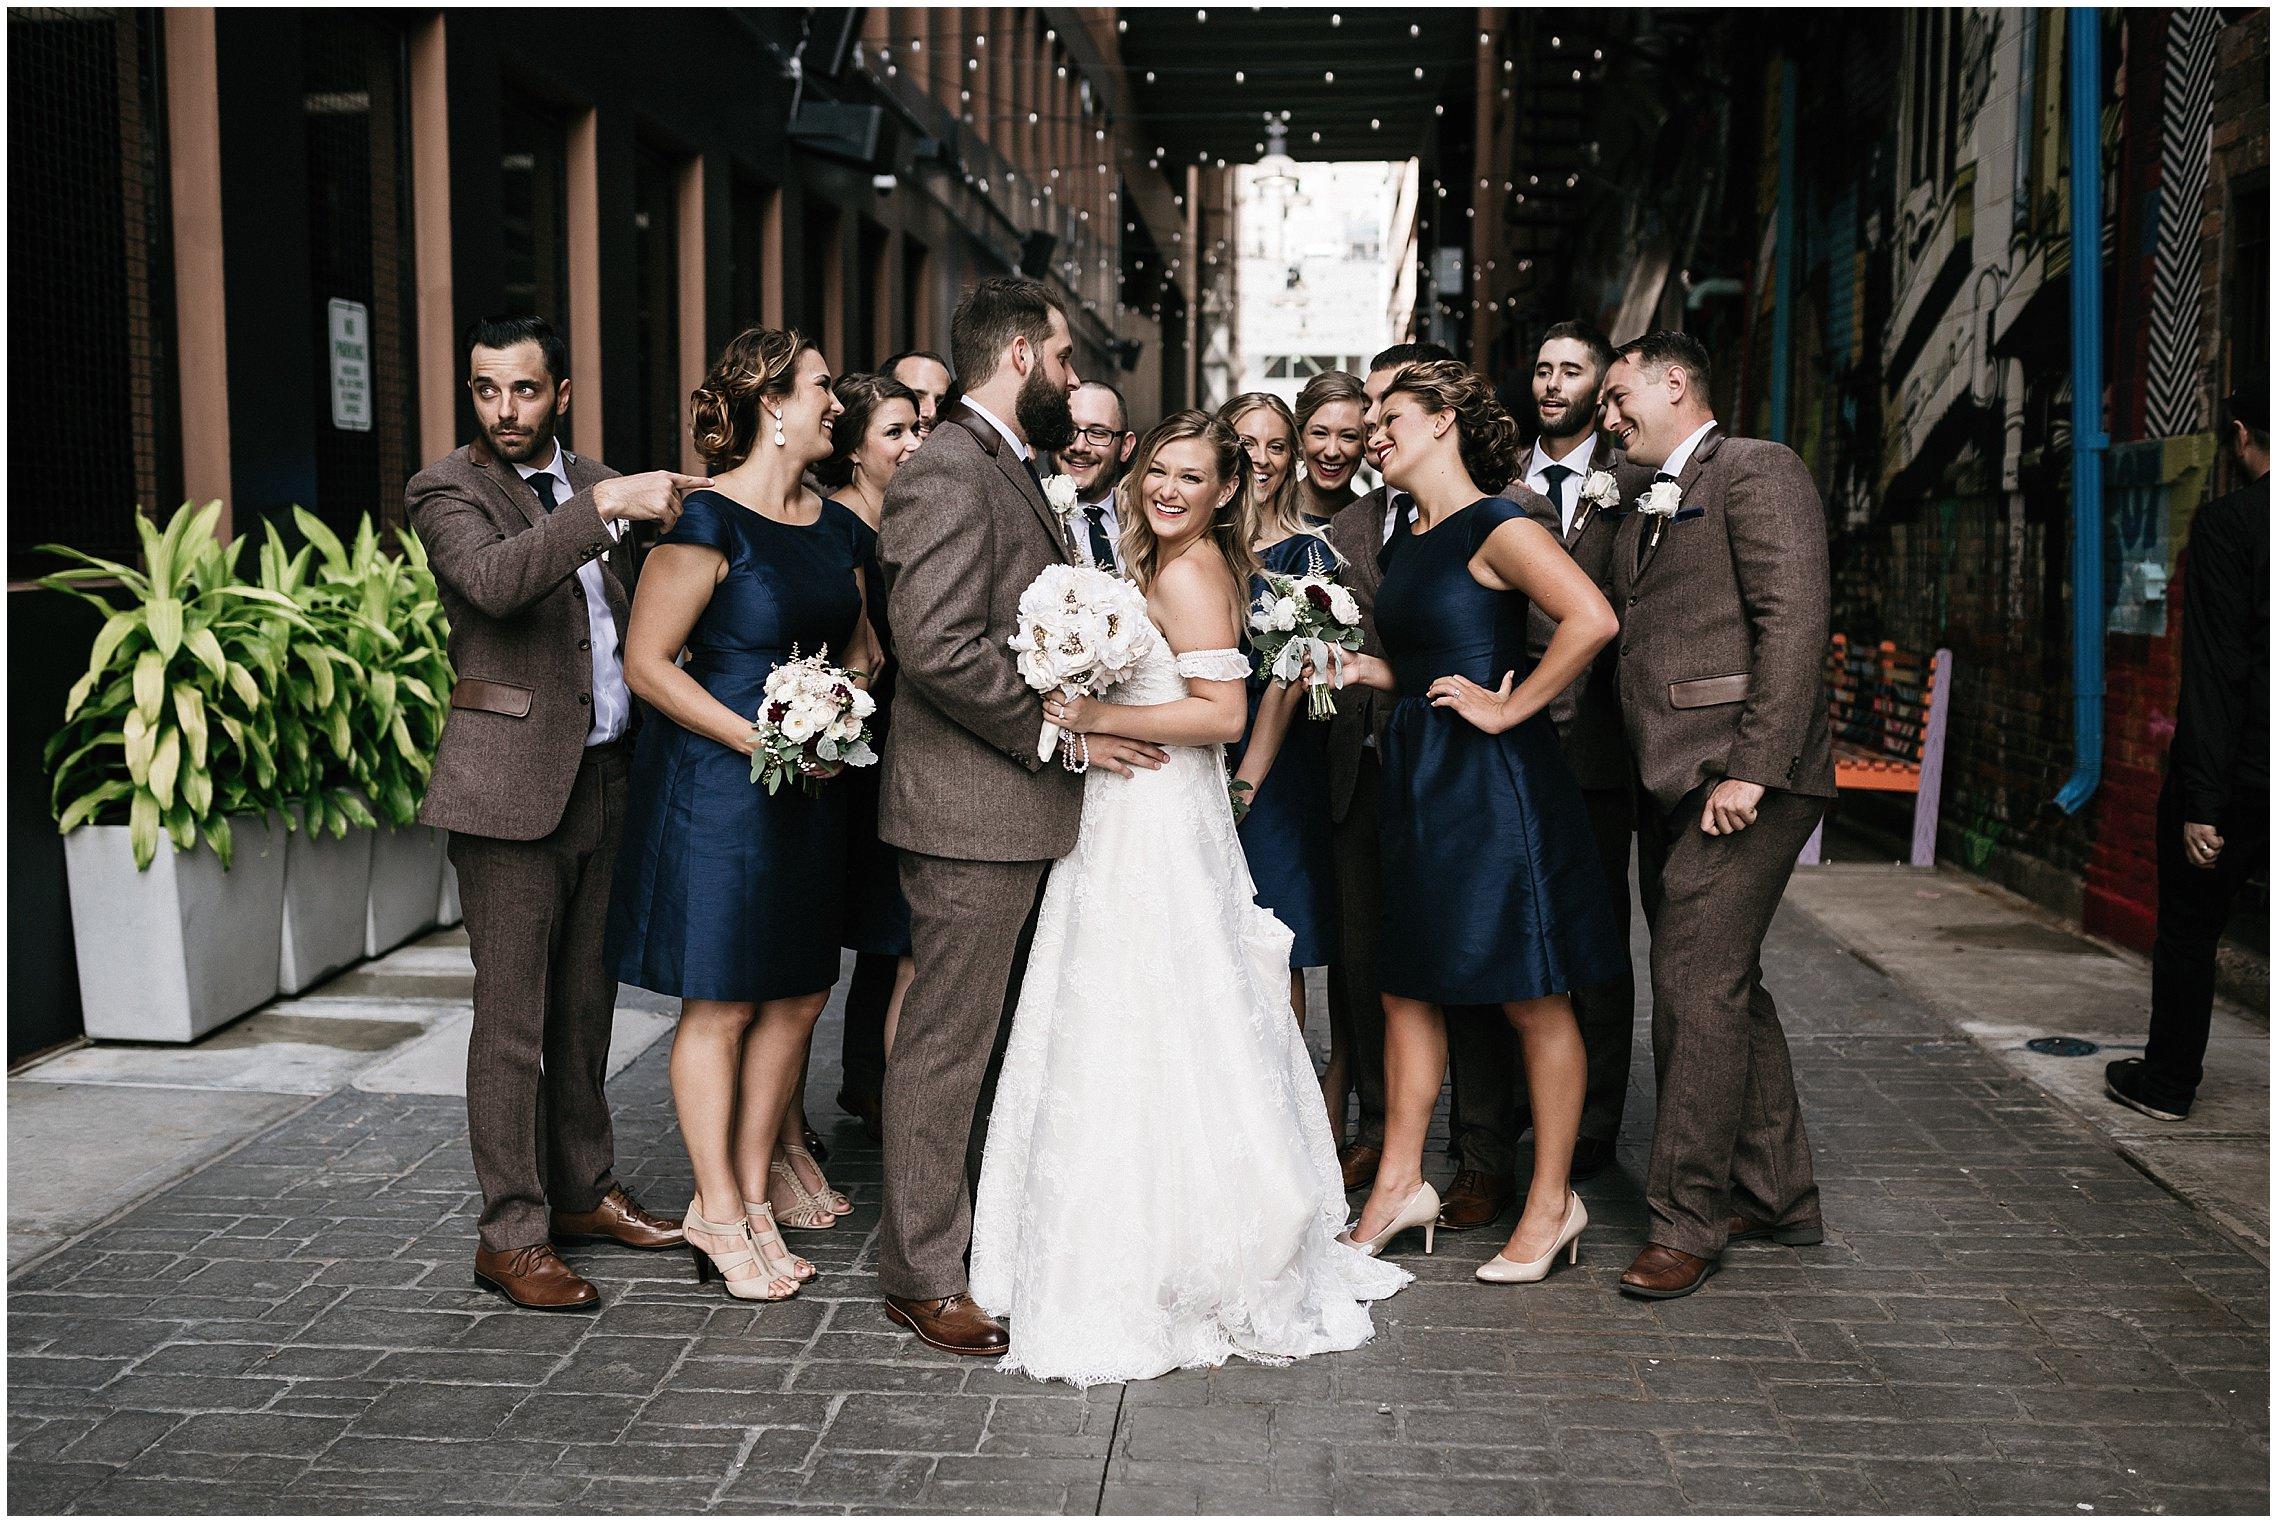 brick_and_mortar_colorado_wedding_photographer_0221.jpg